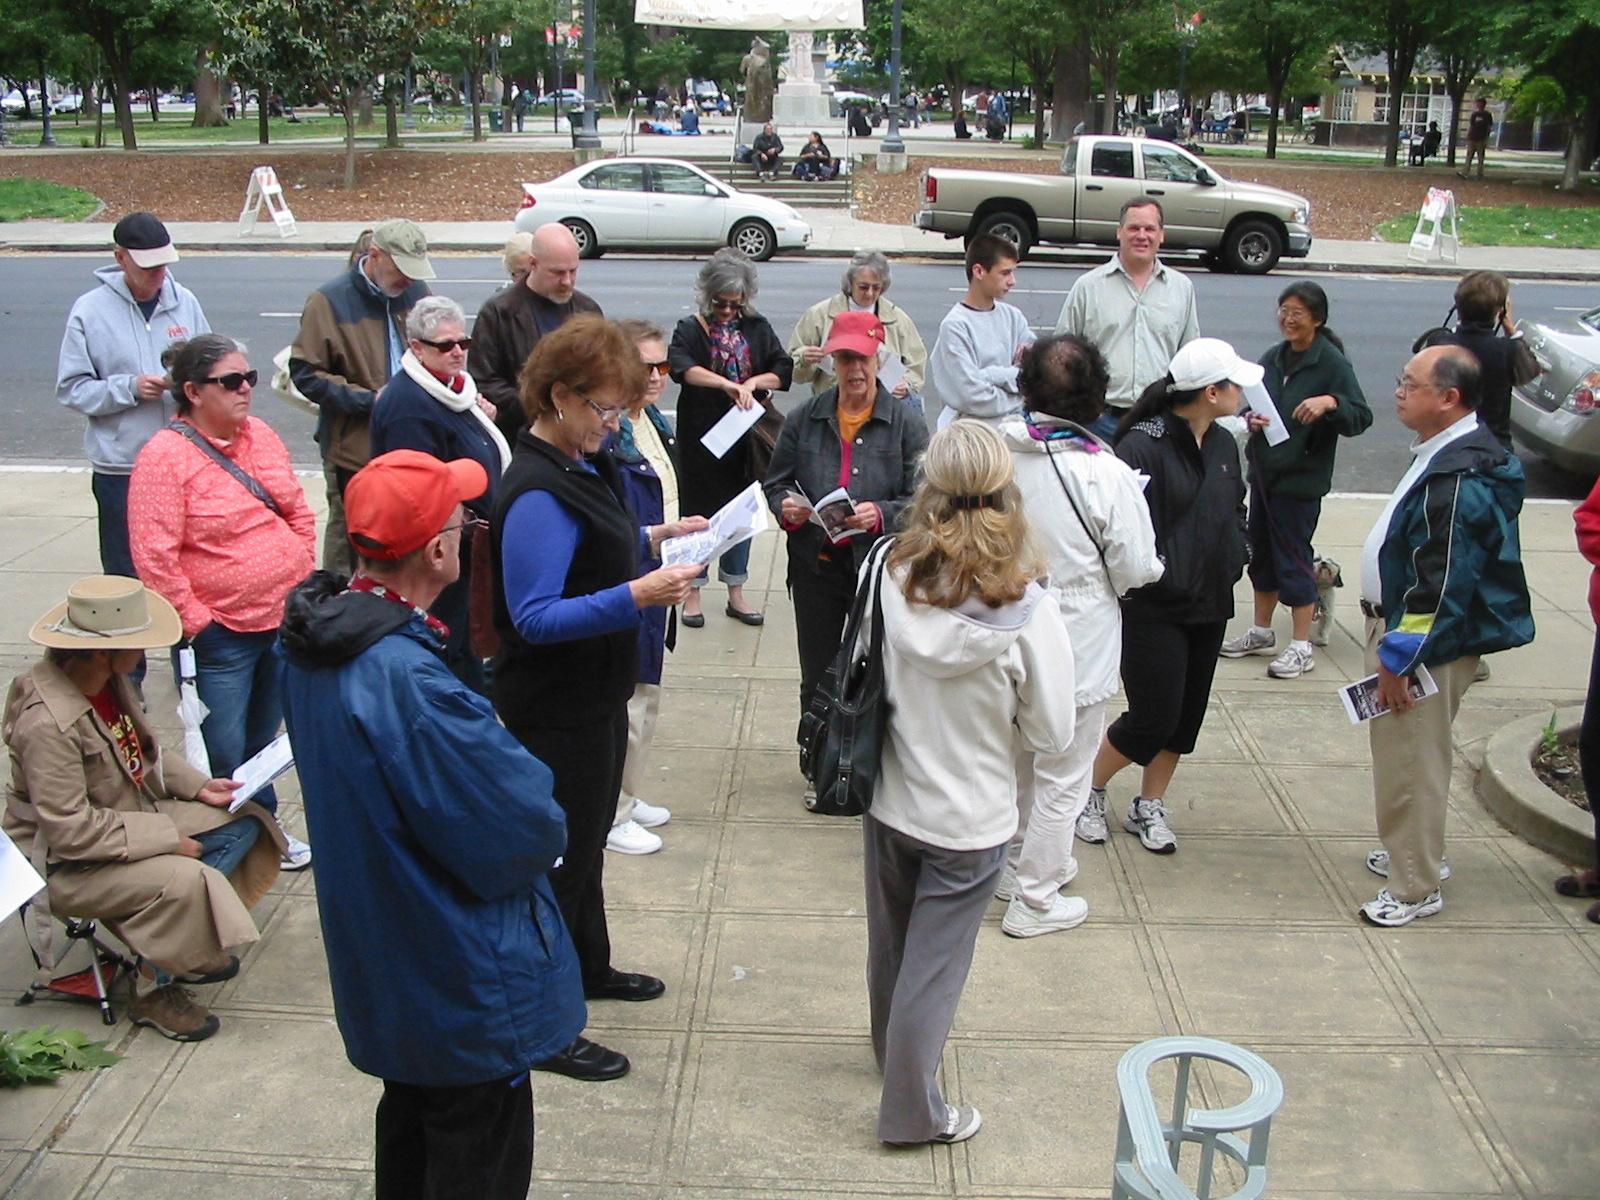 2012 Janes Walk downtown - M. Parfitt.jpg